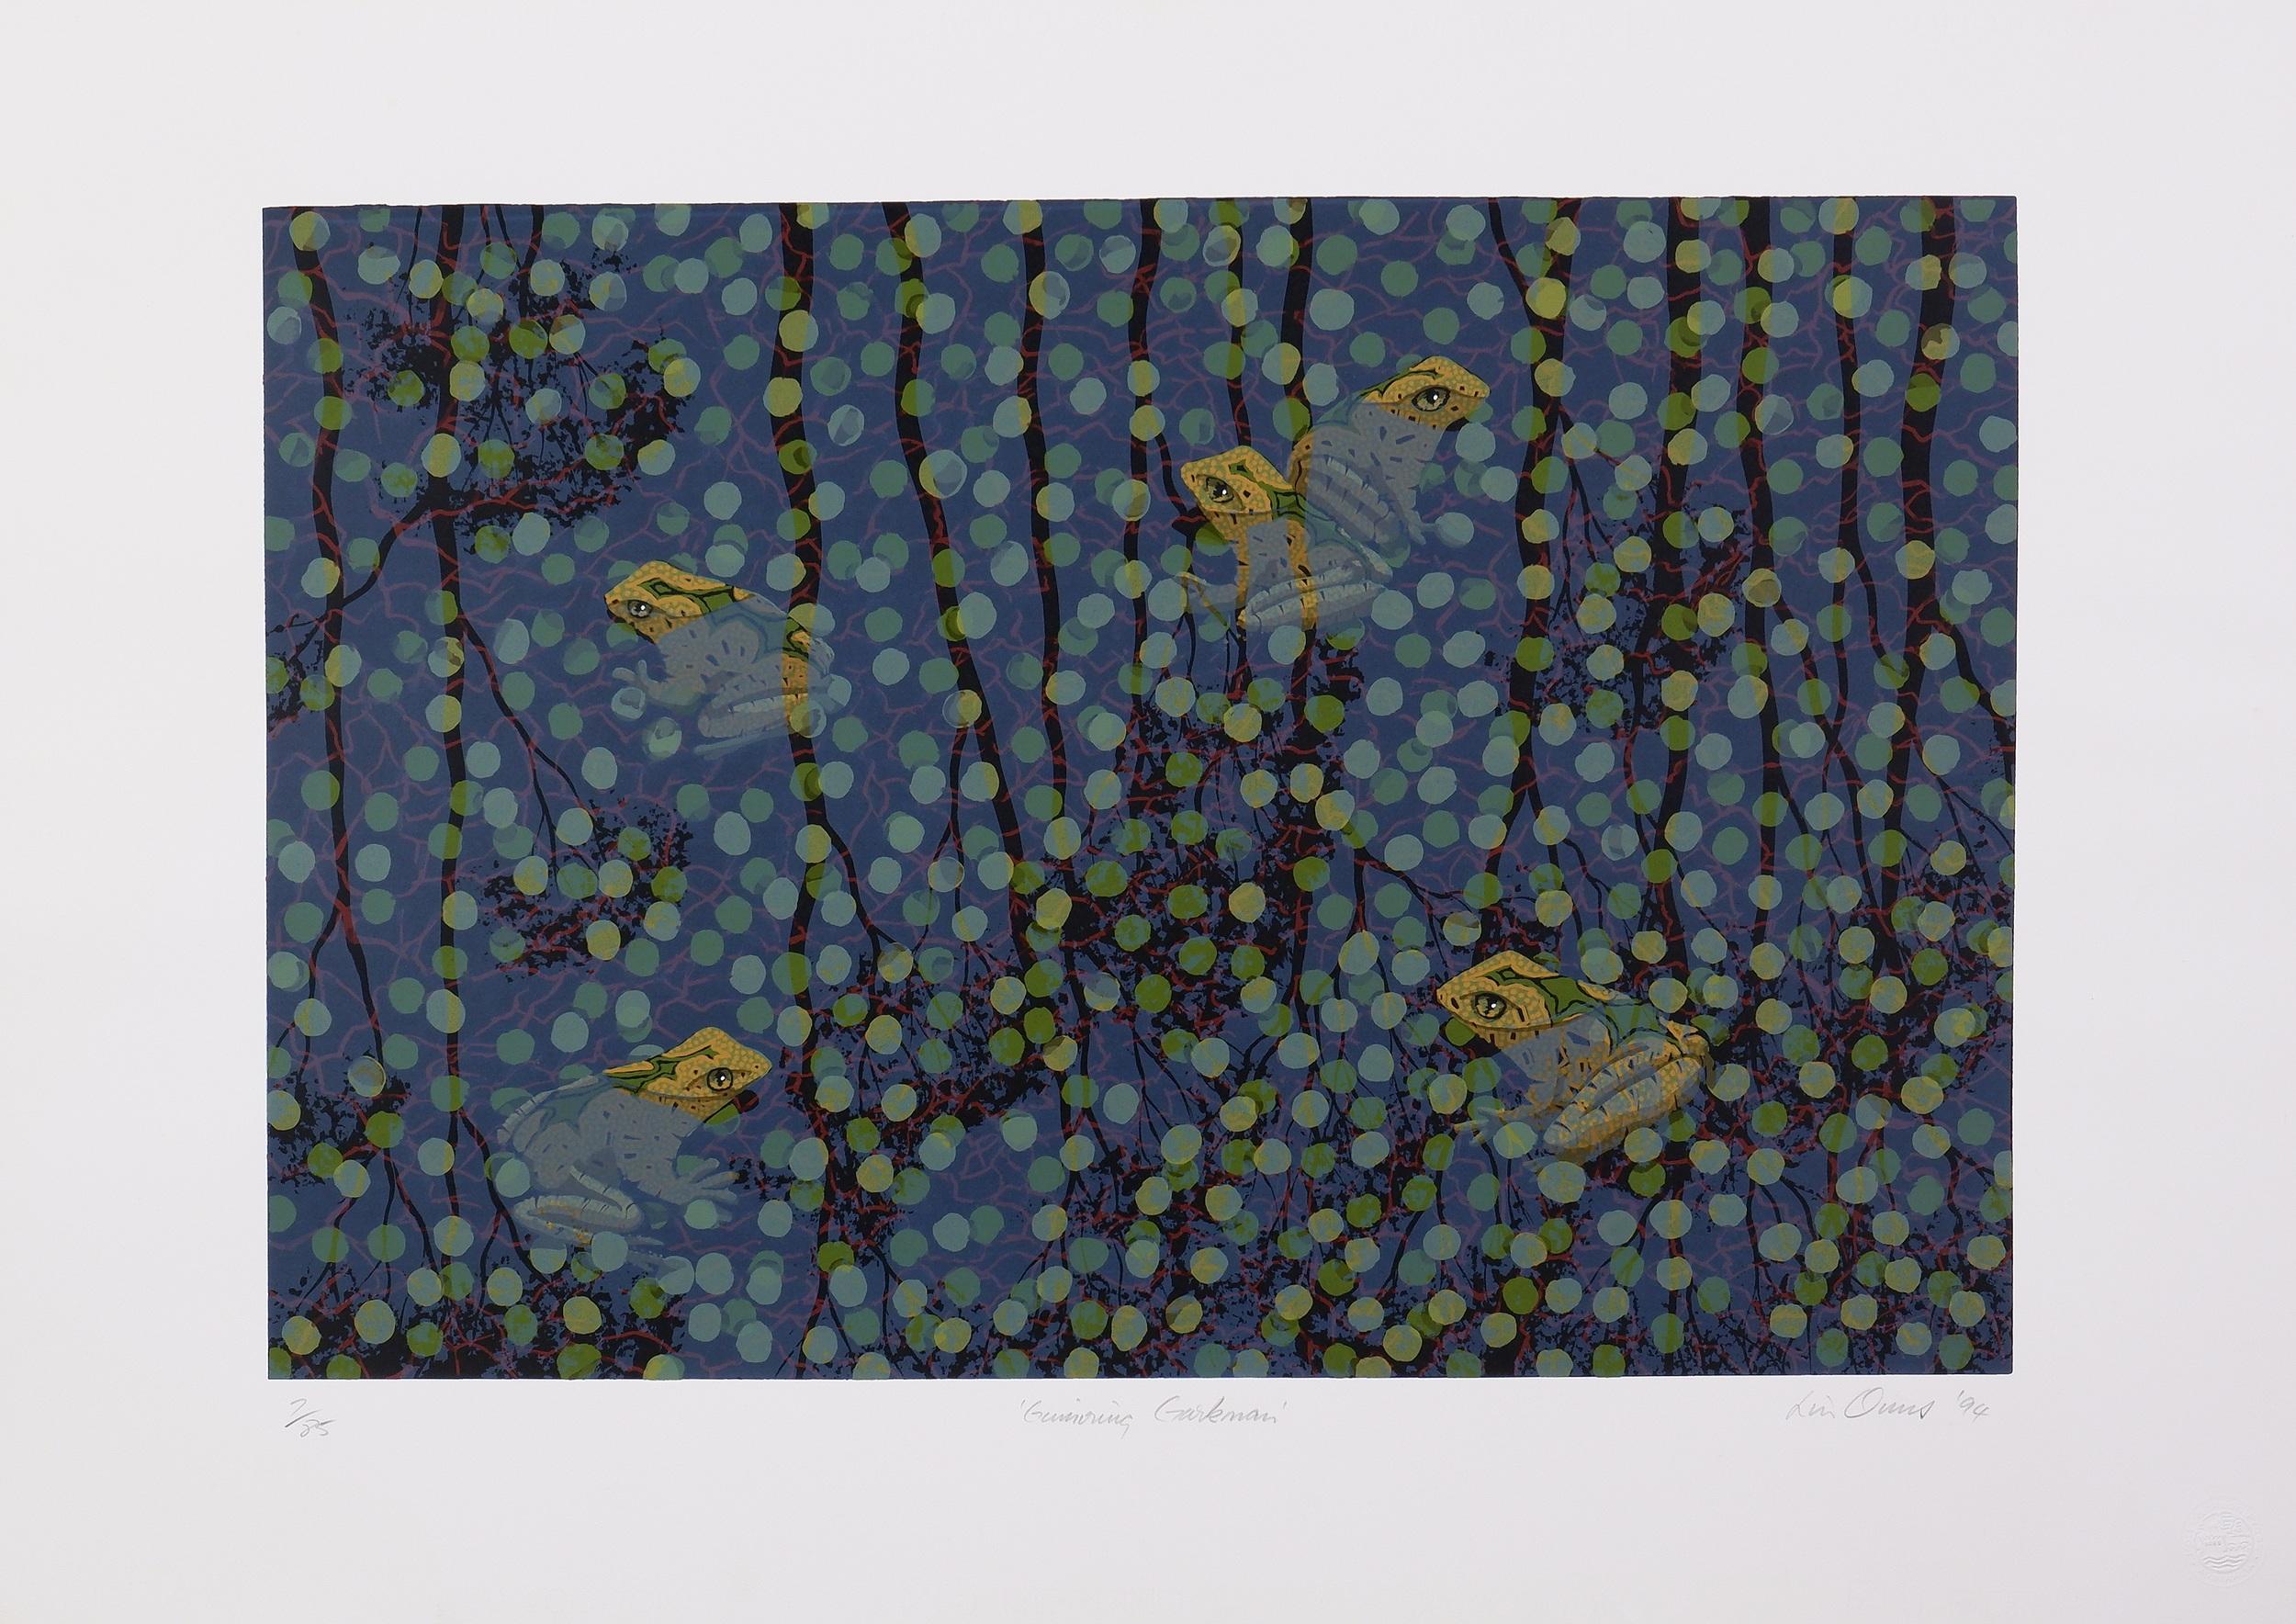 'Lin Onus (1948-1996 Yorta Yorta language group), Gumiring Garkman 1994, Screenprint, 50 x 70 cm (image size) '